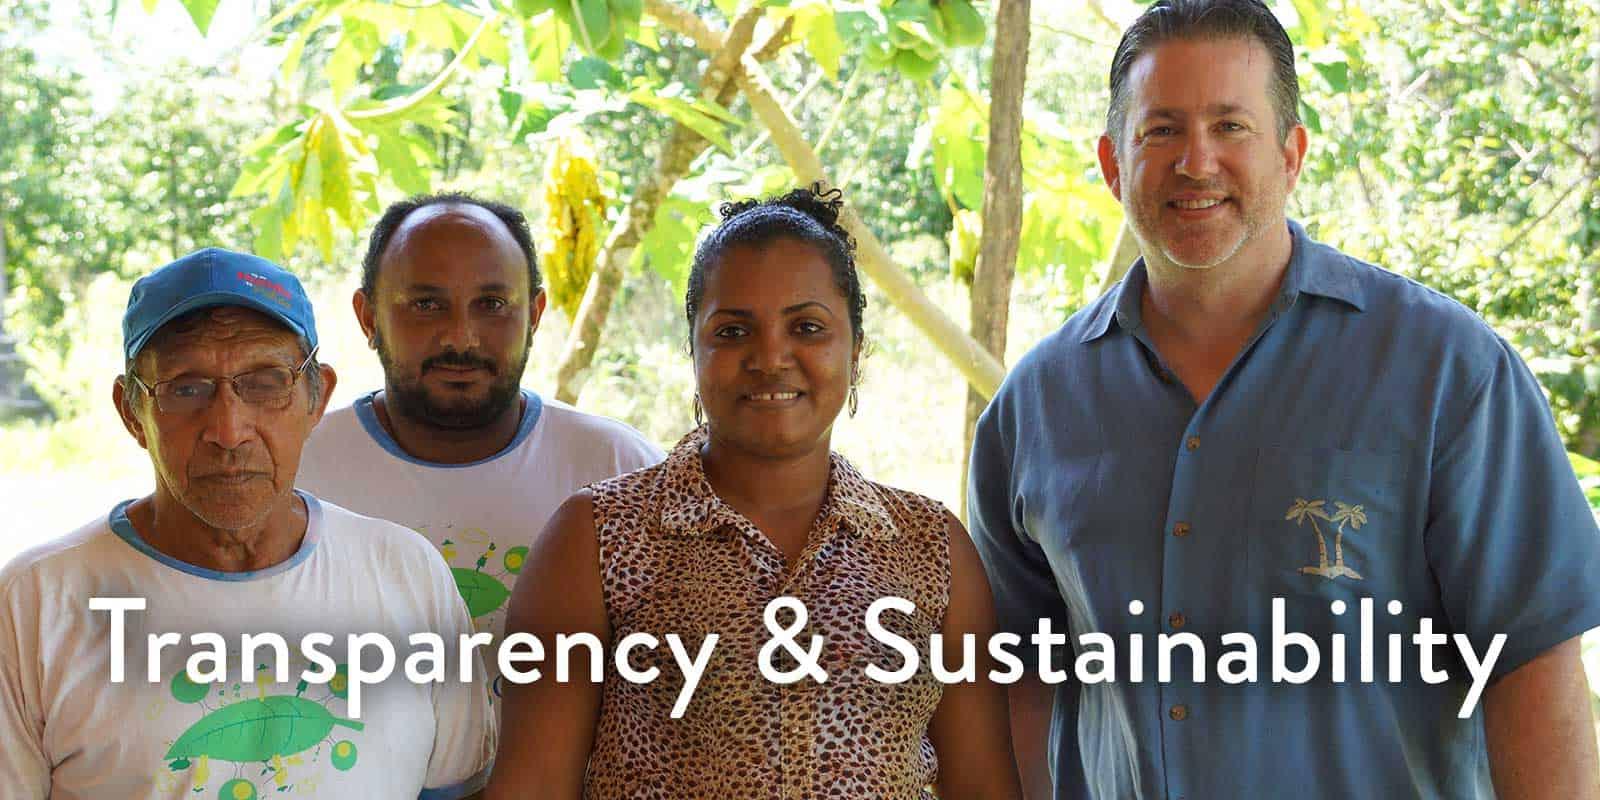 Transparency & Sustainability Follwed By TEADORA CBD